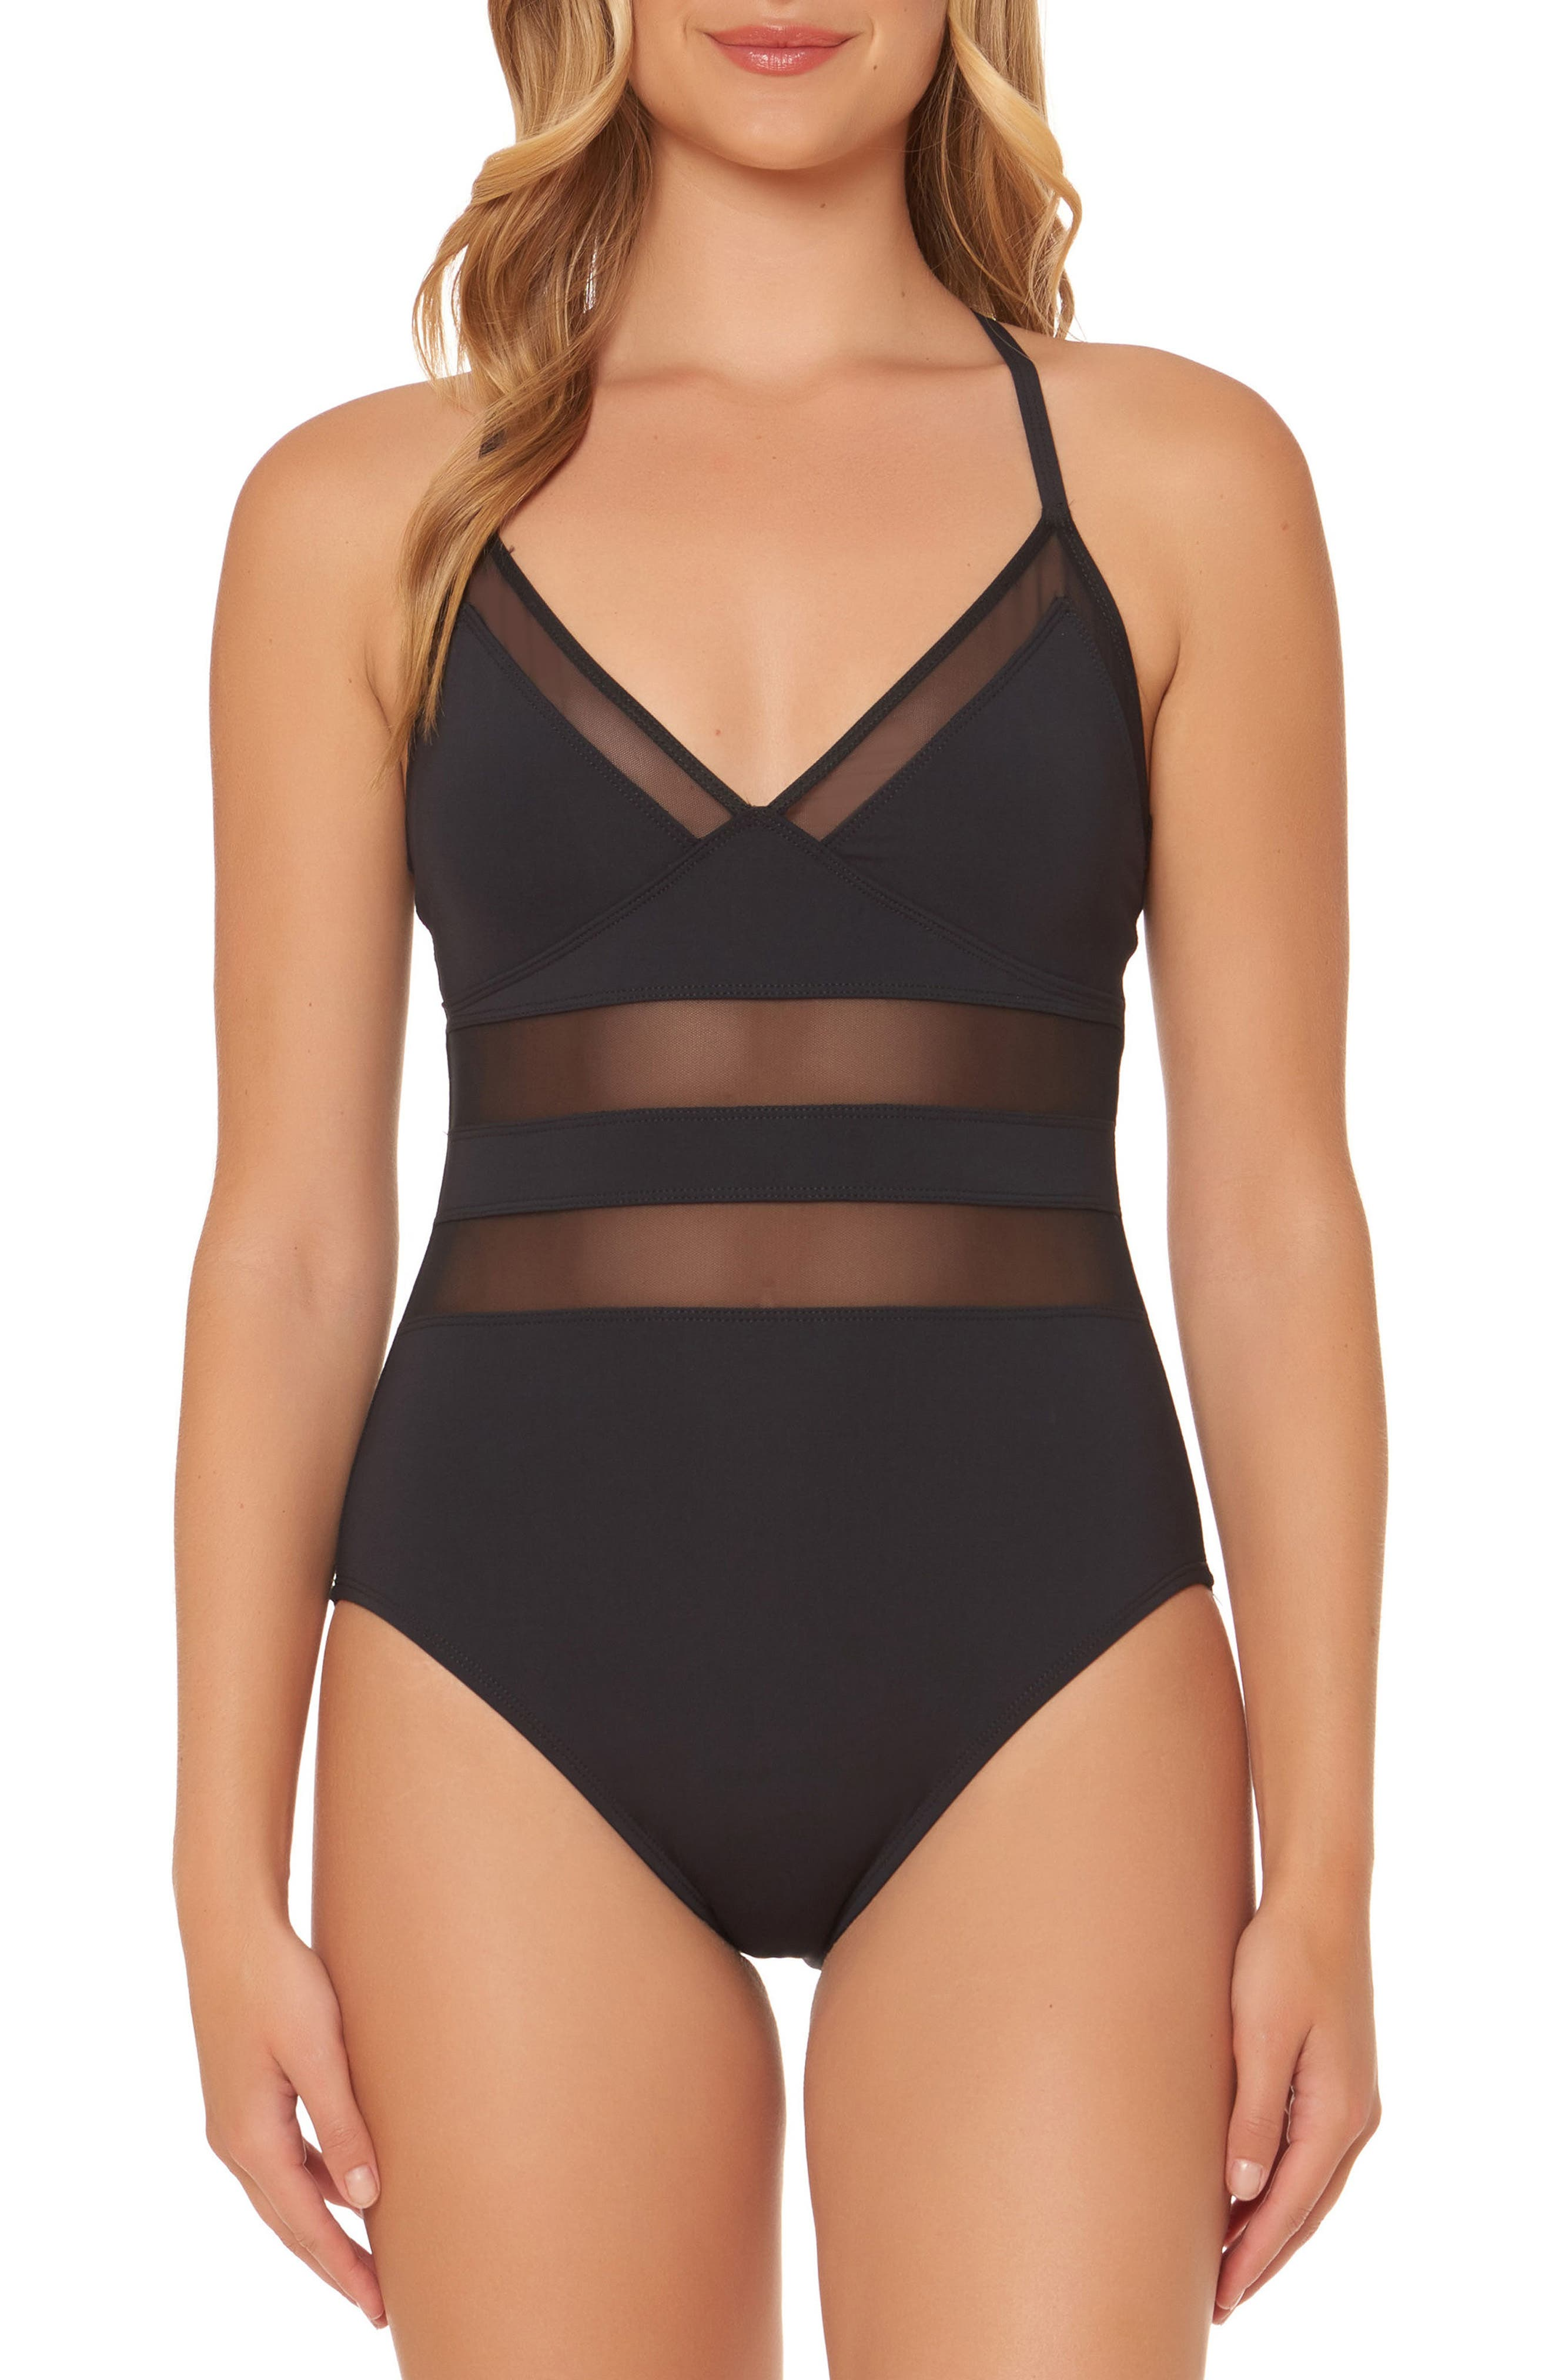 BLEU by Rod Beattie Mesh Inset One-Piece Swimsuit,                         Main,                         color, 001